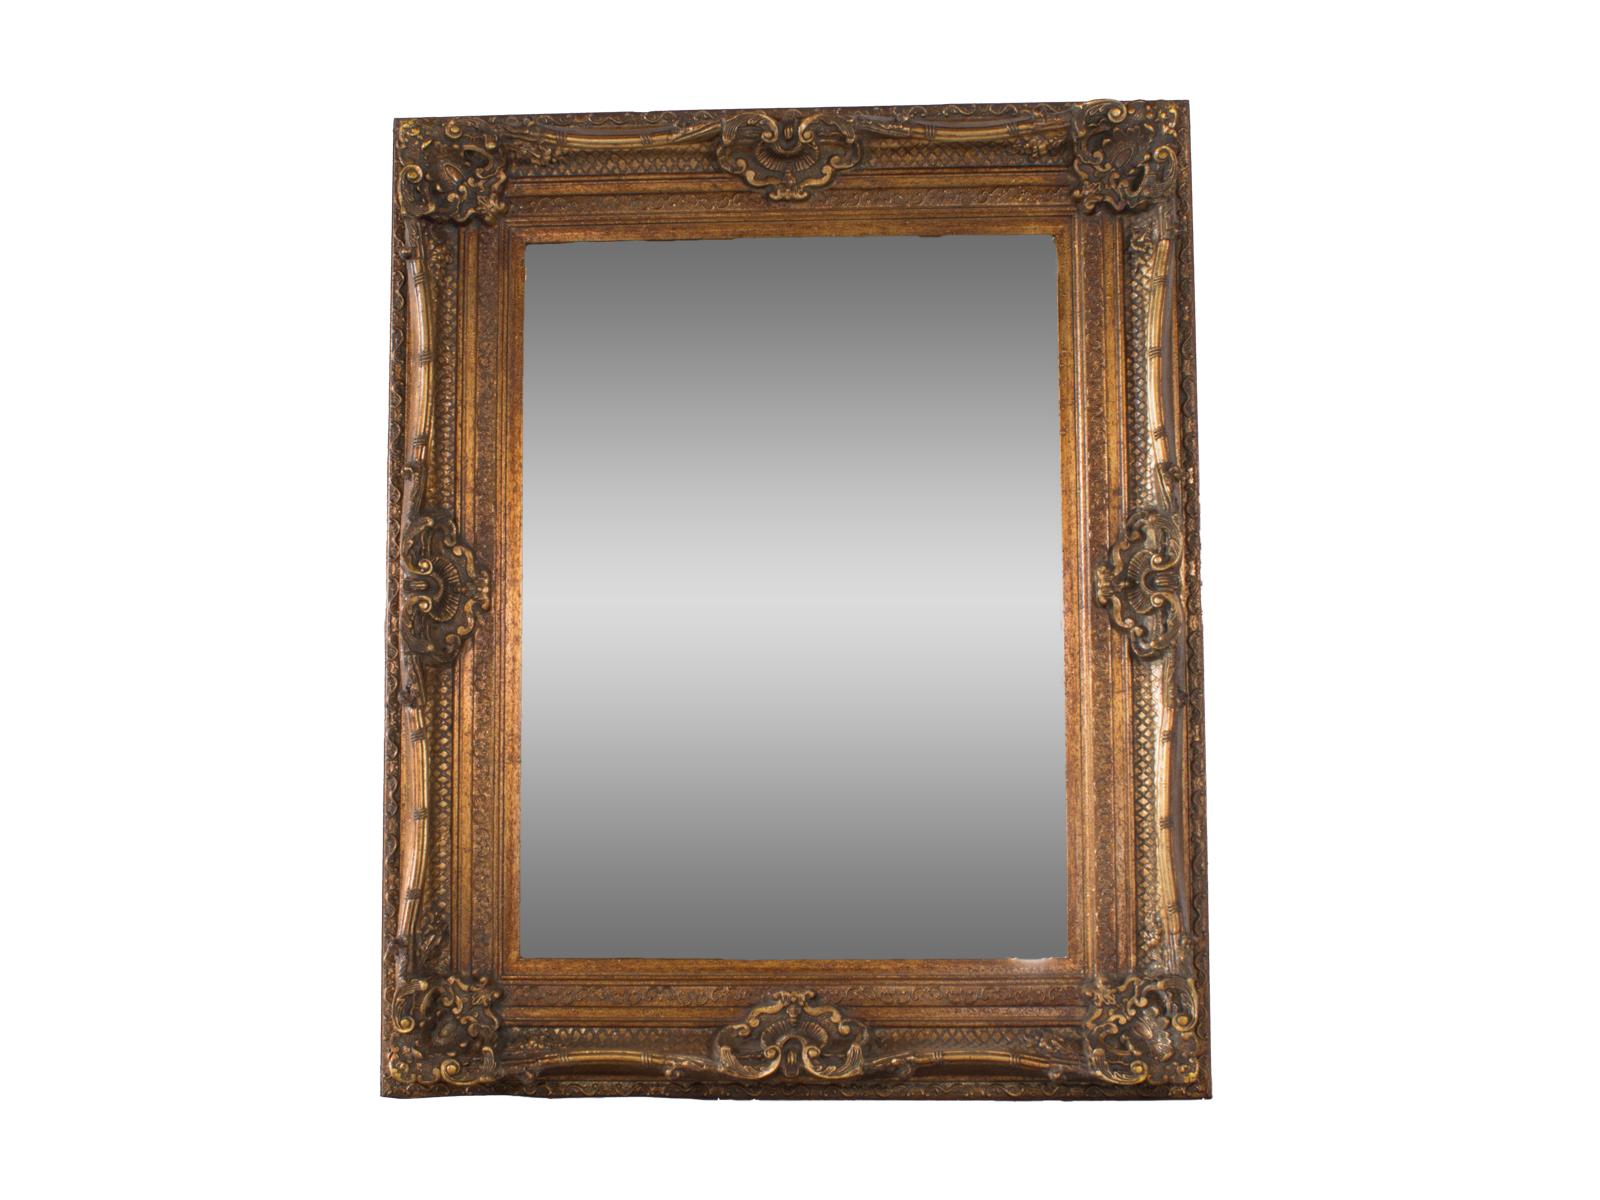 Antique Gold Swept Mirror